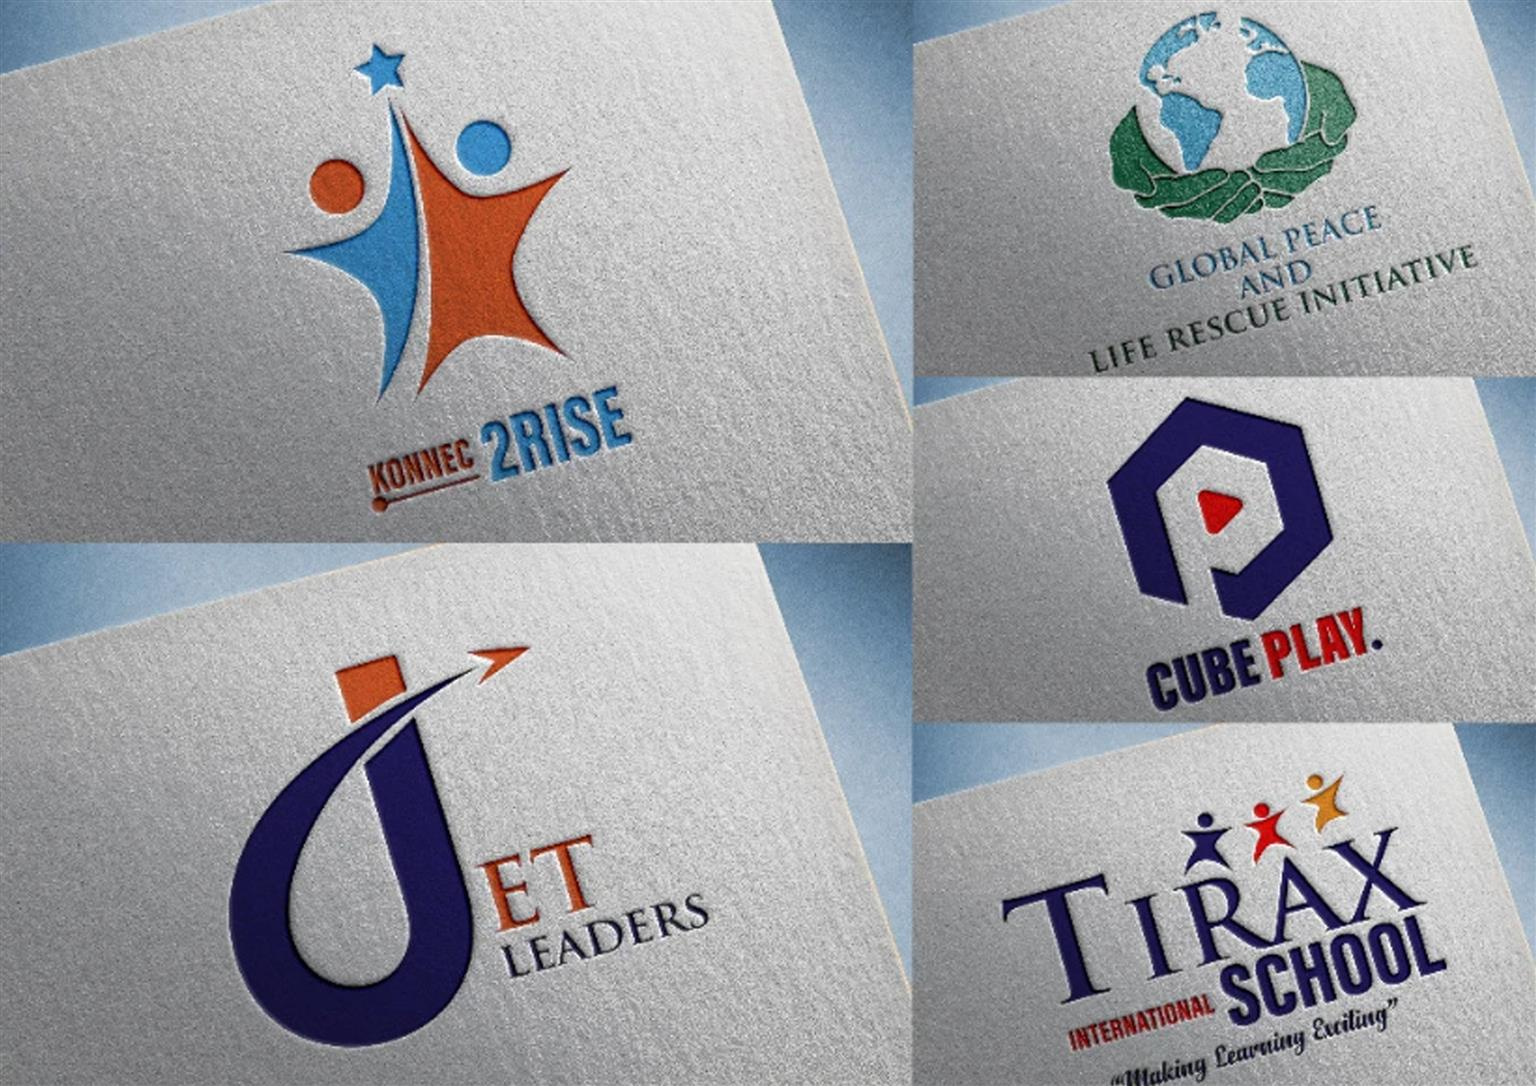 We Brainstorm 10 Business Name, Brand Name, Company Name